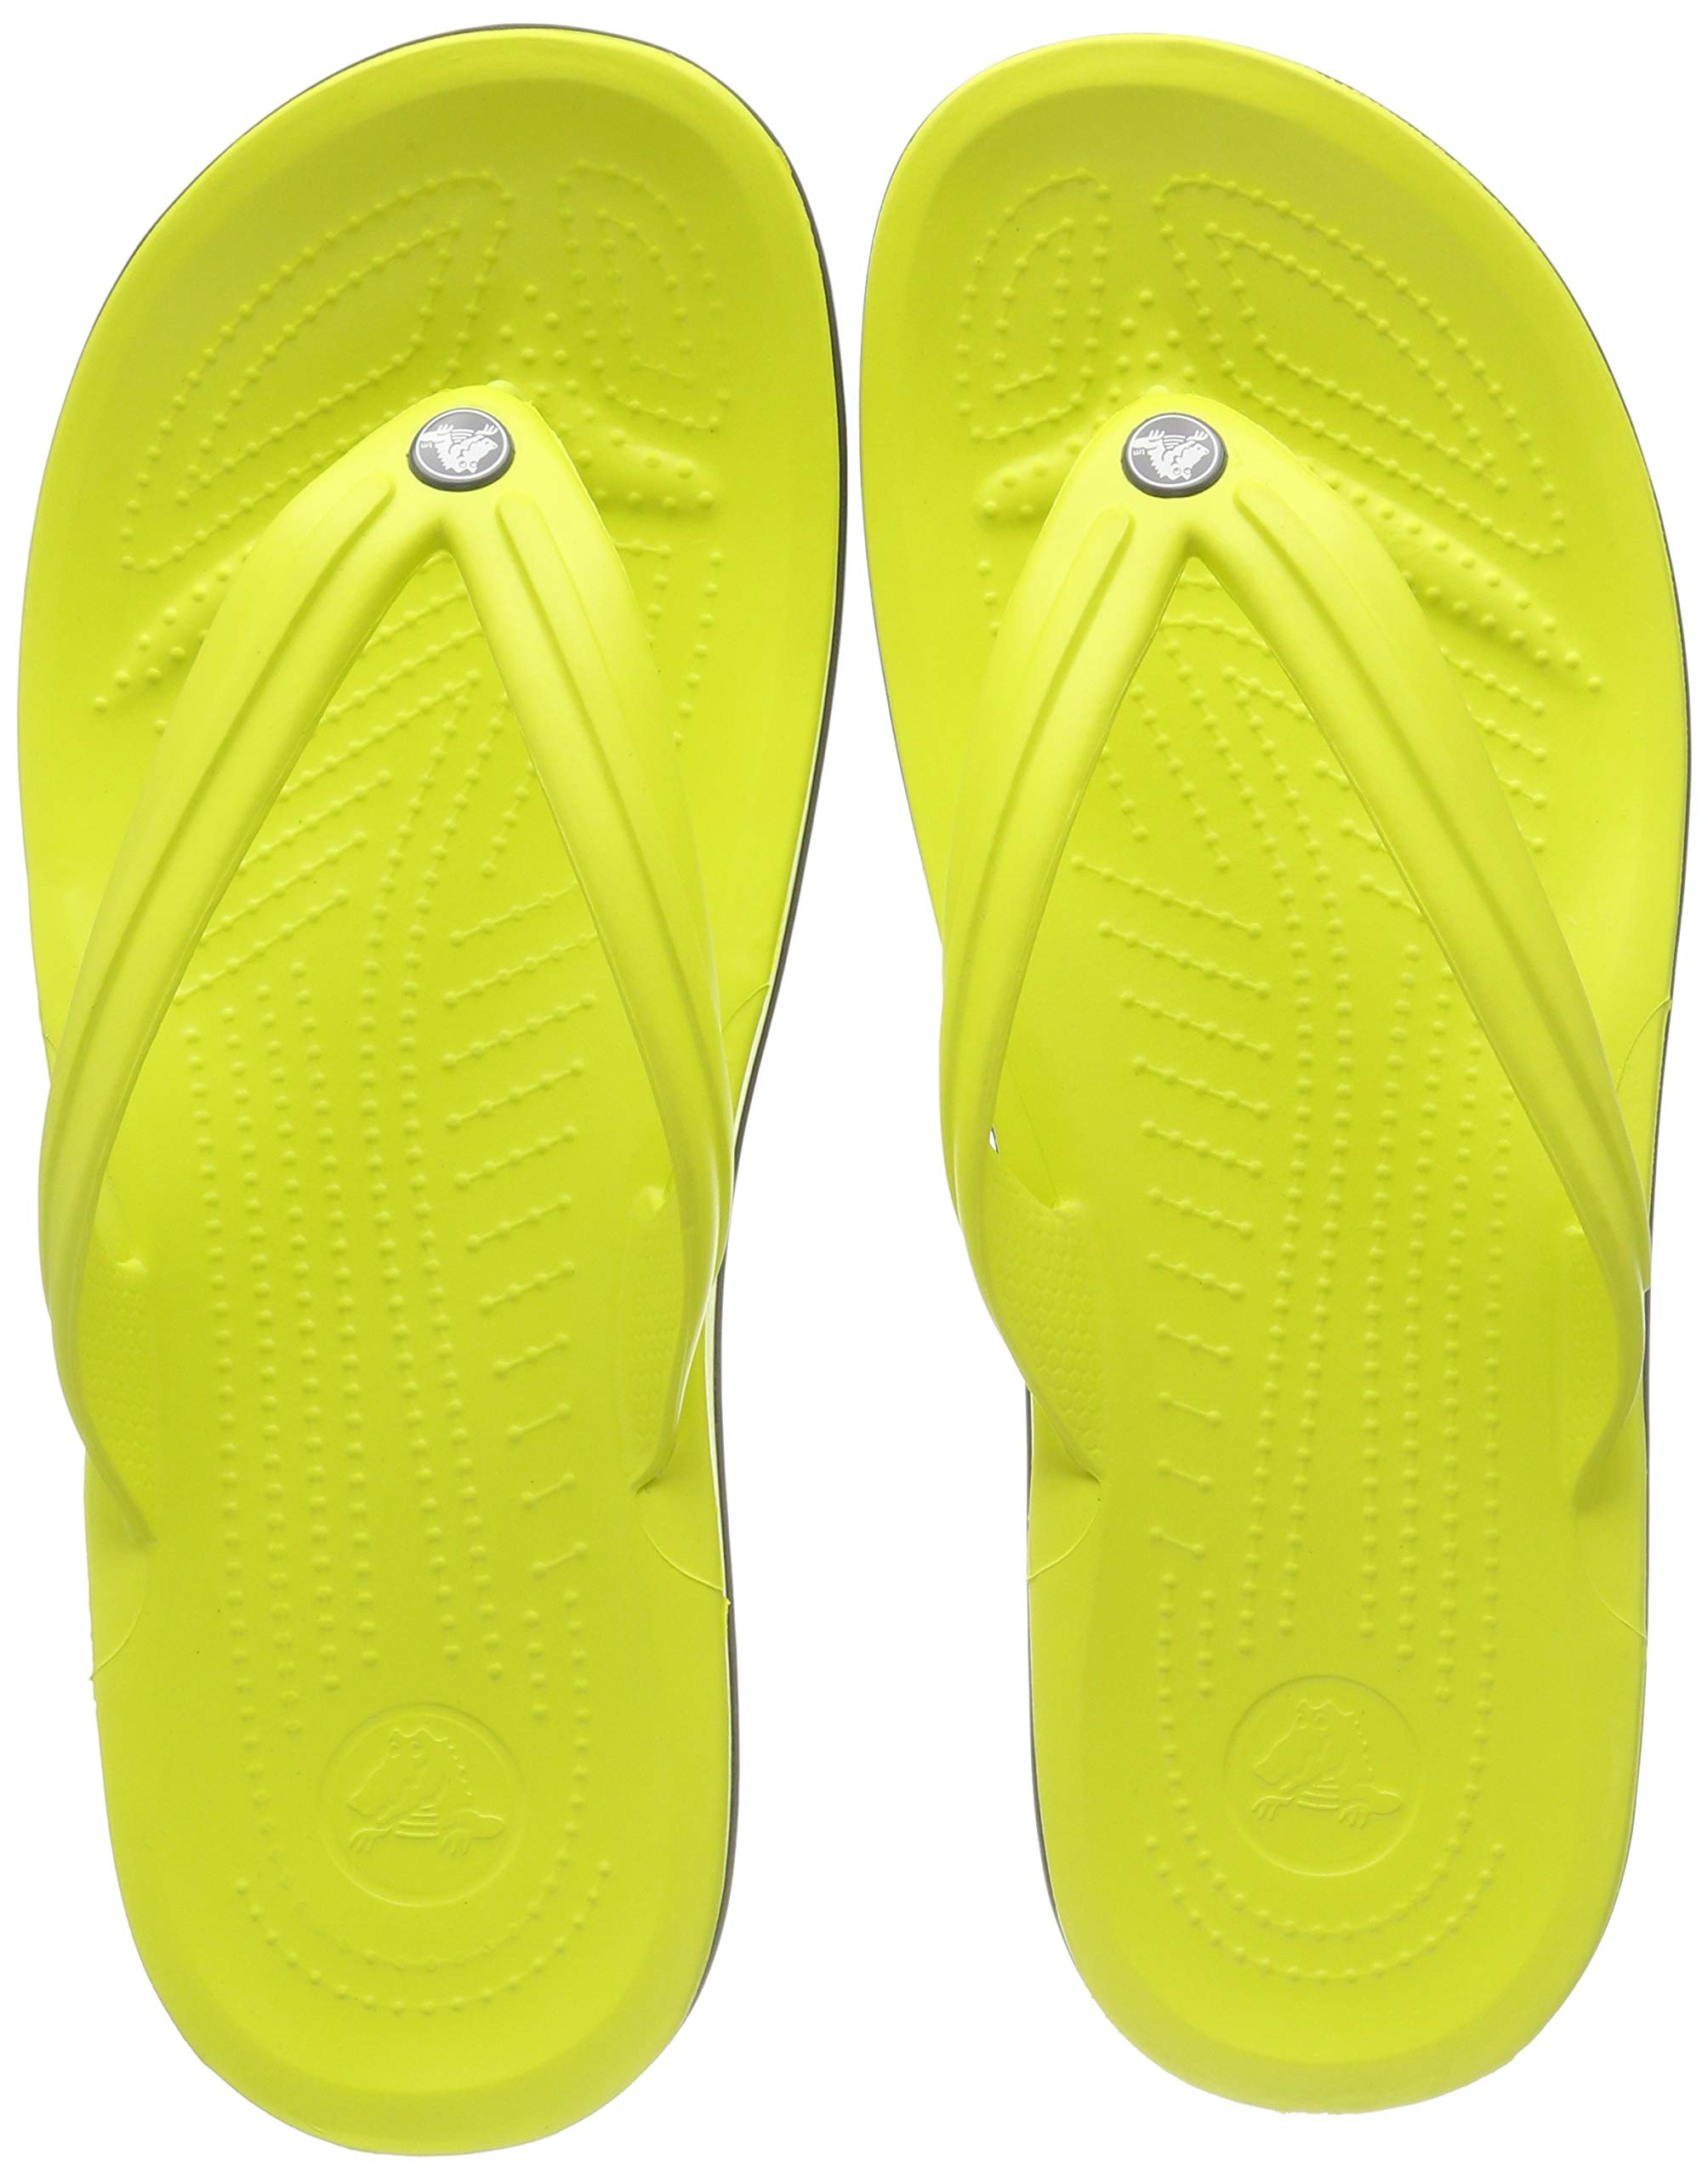 915b2b4d7 Galleon - Crocs Unisex Adults Crocband Flip Flops